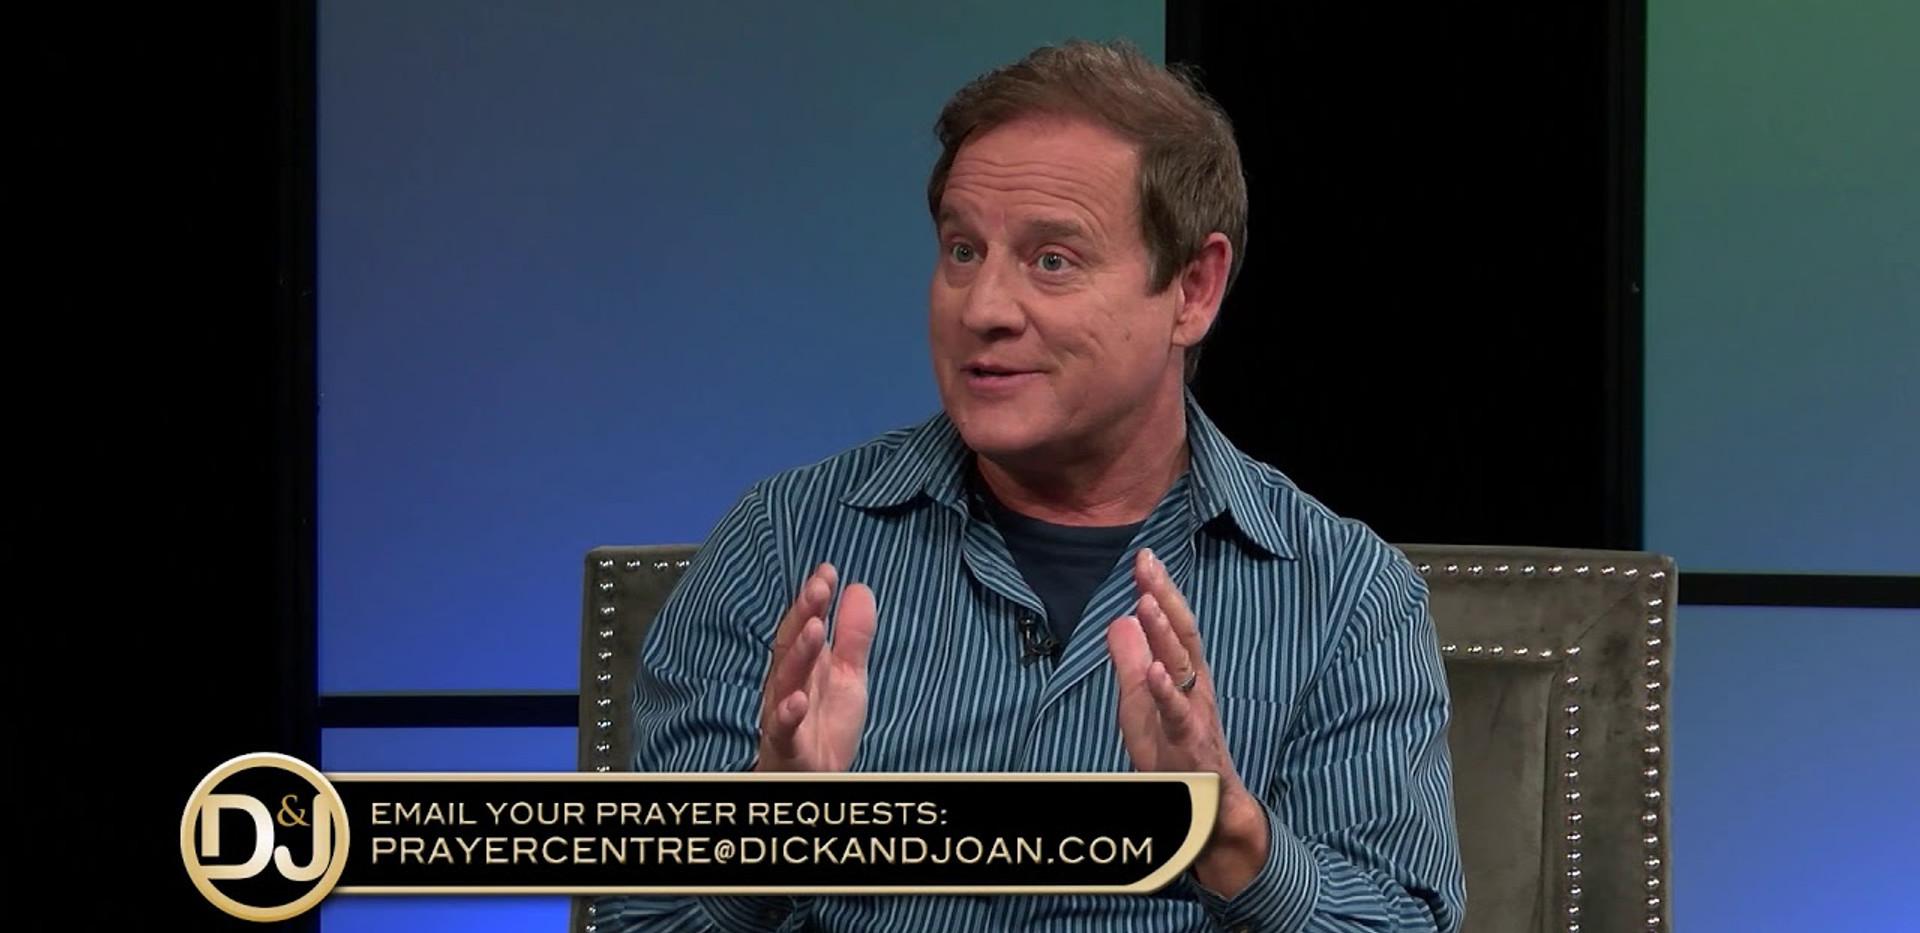 LIFELINE TODAY | Season 6, Episode 214 | Craig Buroker